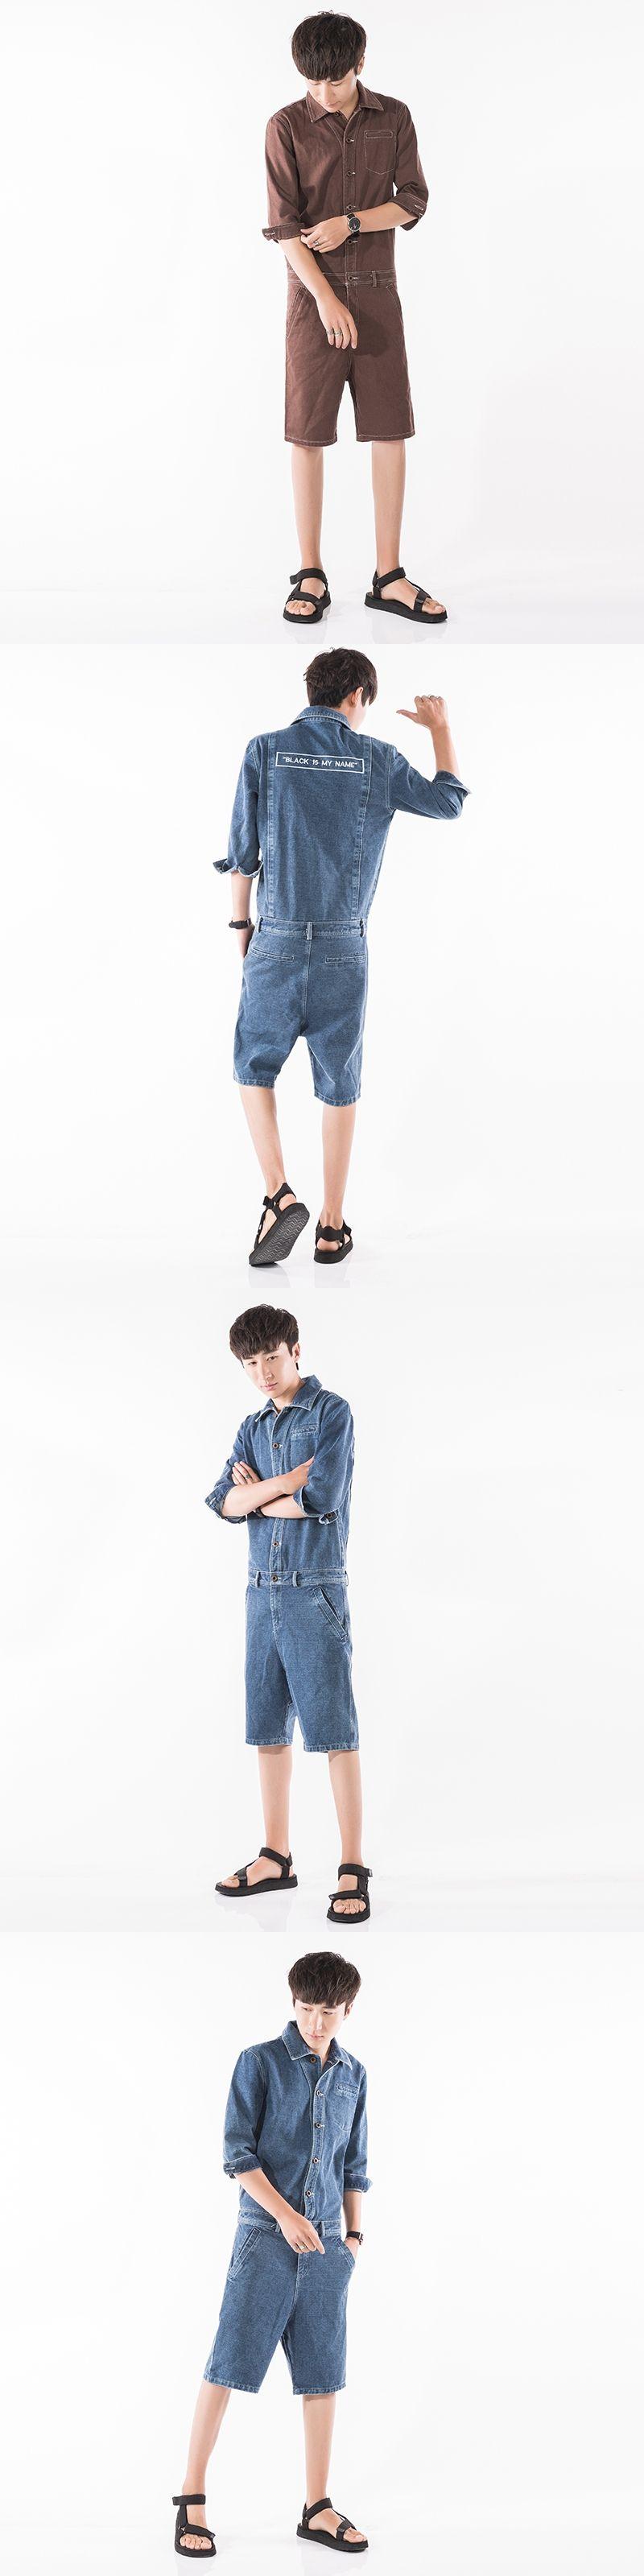 653b376d8eed Summer Men Denim Shorts Jumpsuits Rompers Harem Shorts Zipper Fashion  Casual Jeans Jumpsuits Slim Fit Shorts